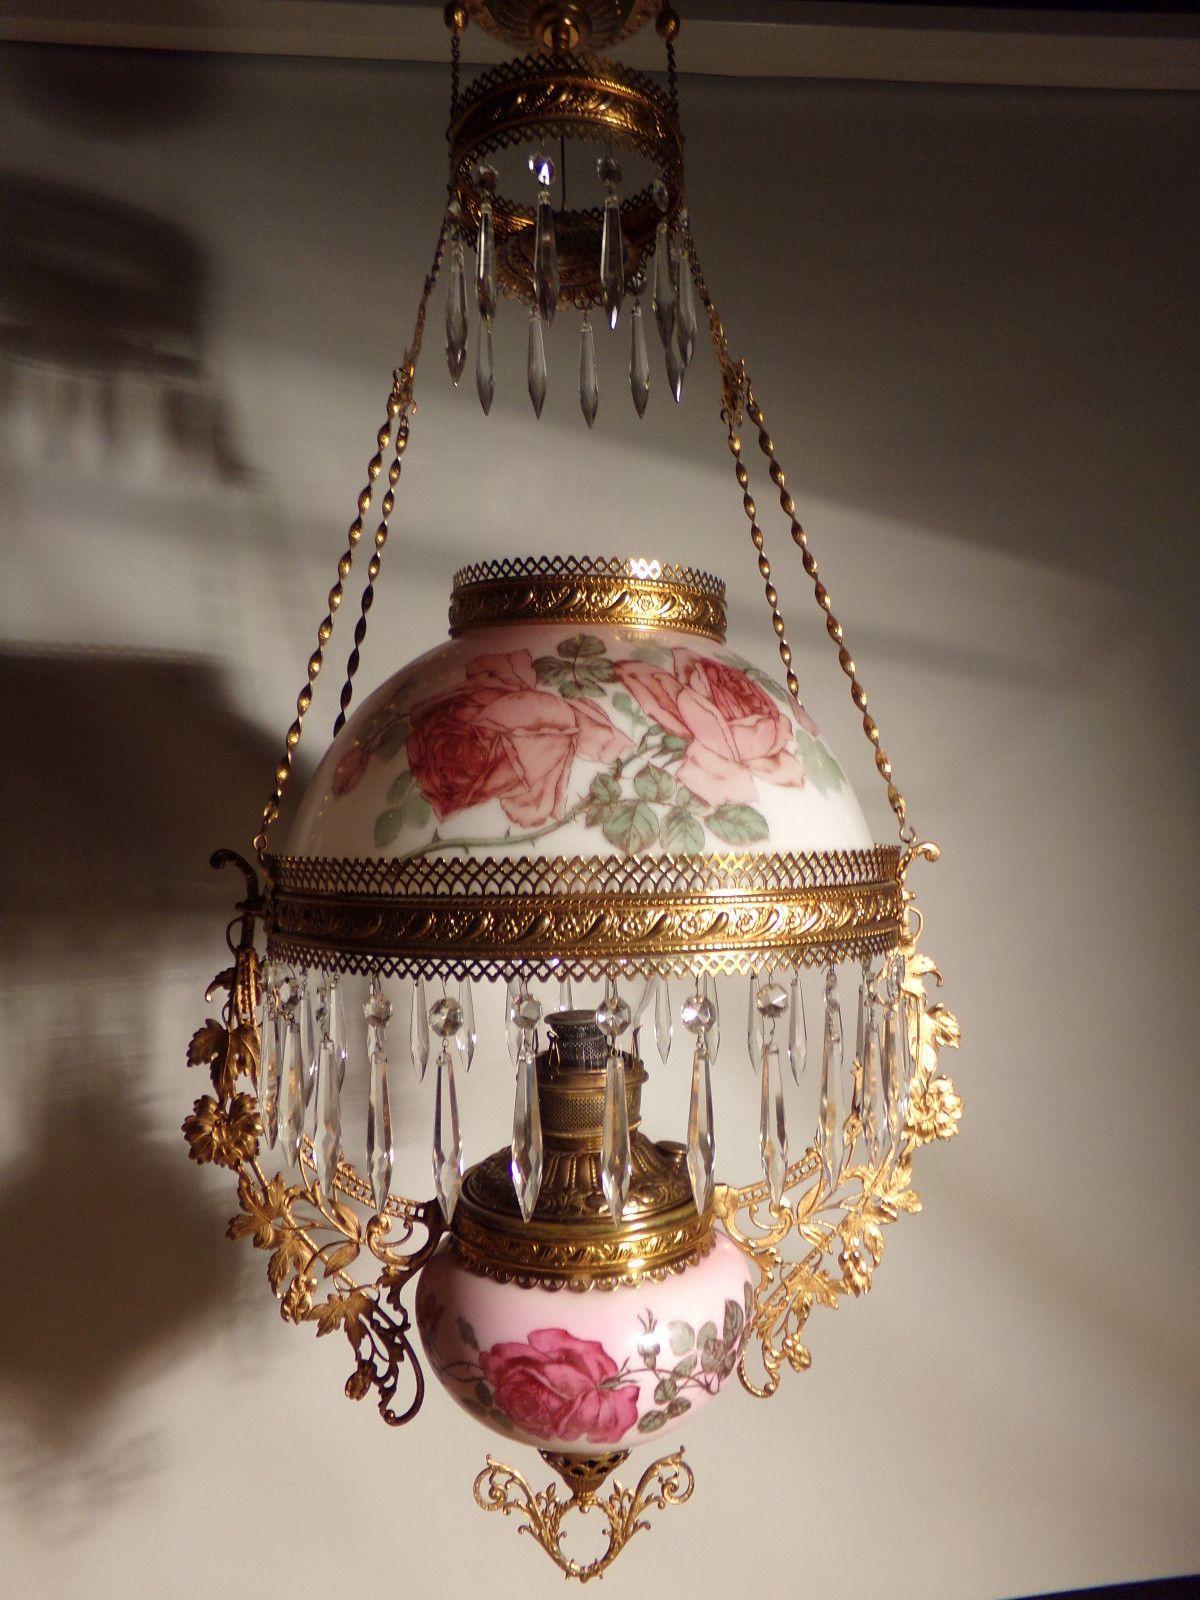 All Original Antique Miller Hanging Oil Lamp Ebay Victorian